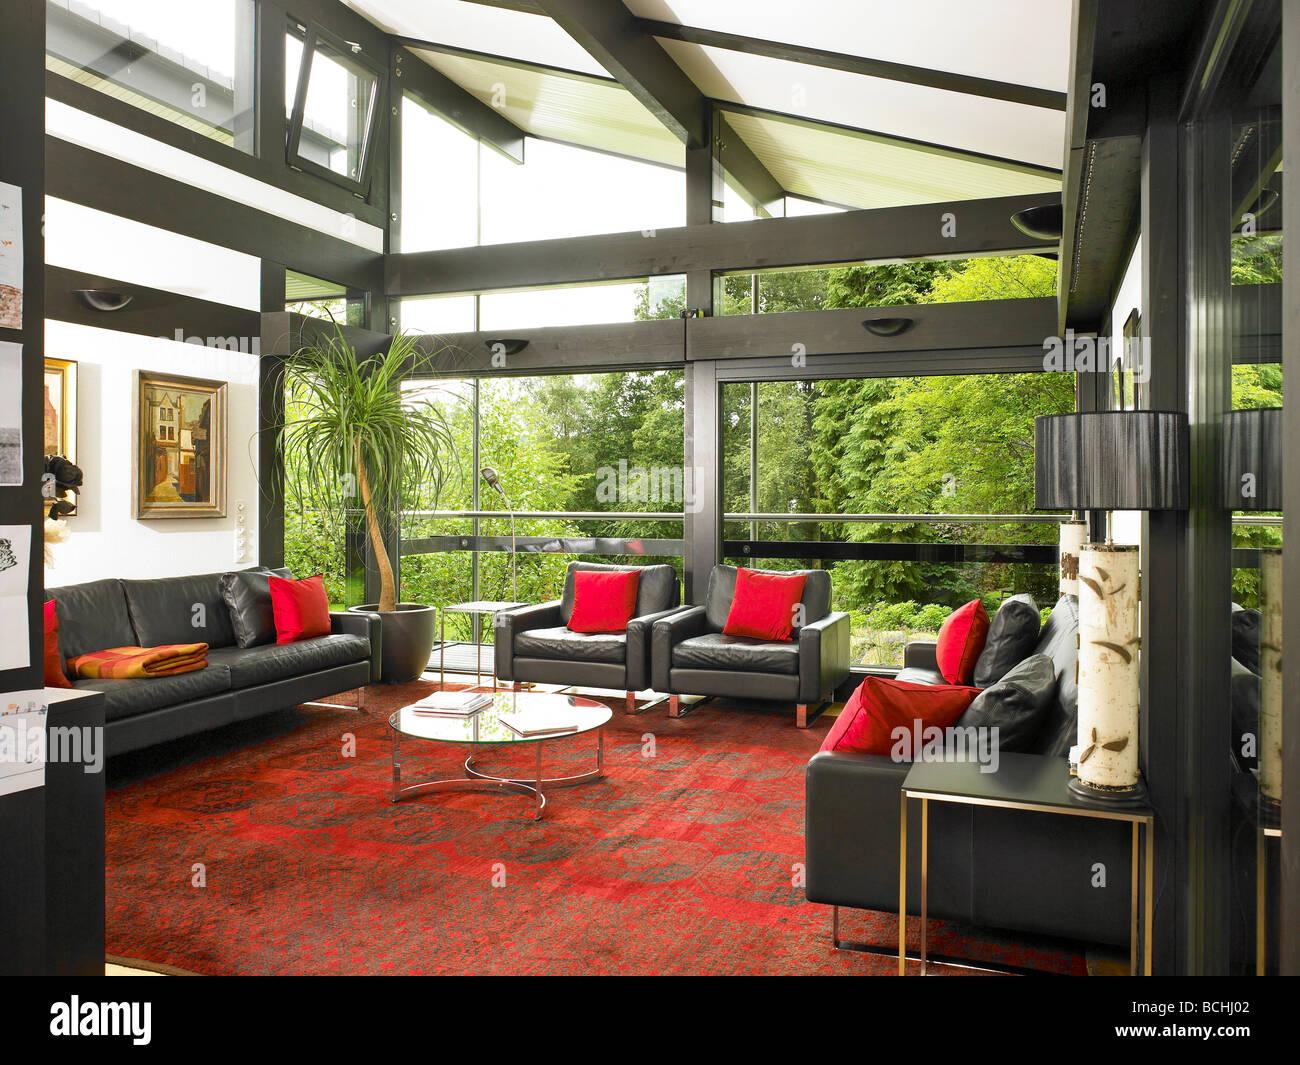 Exterior: Self Build Huf Haus Living Room Interior Stock Photo